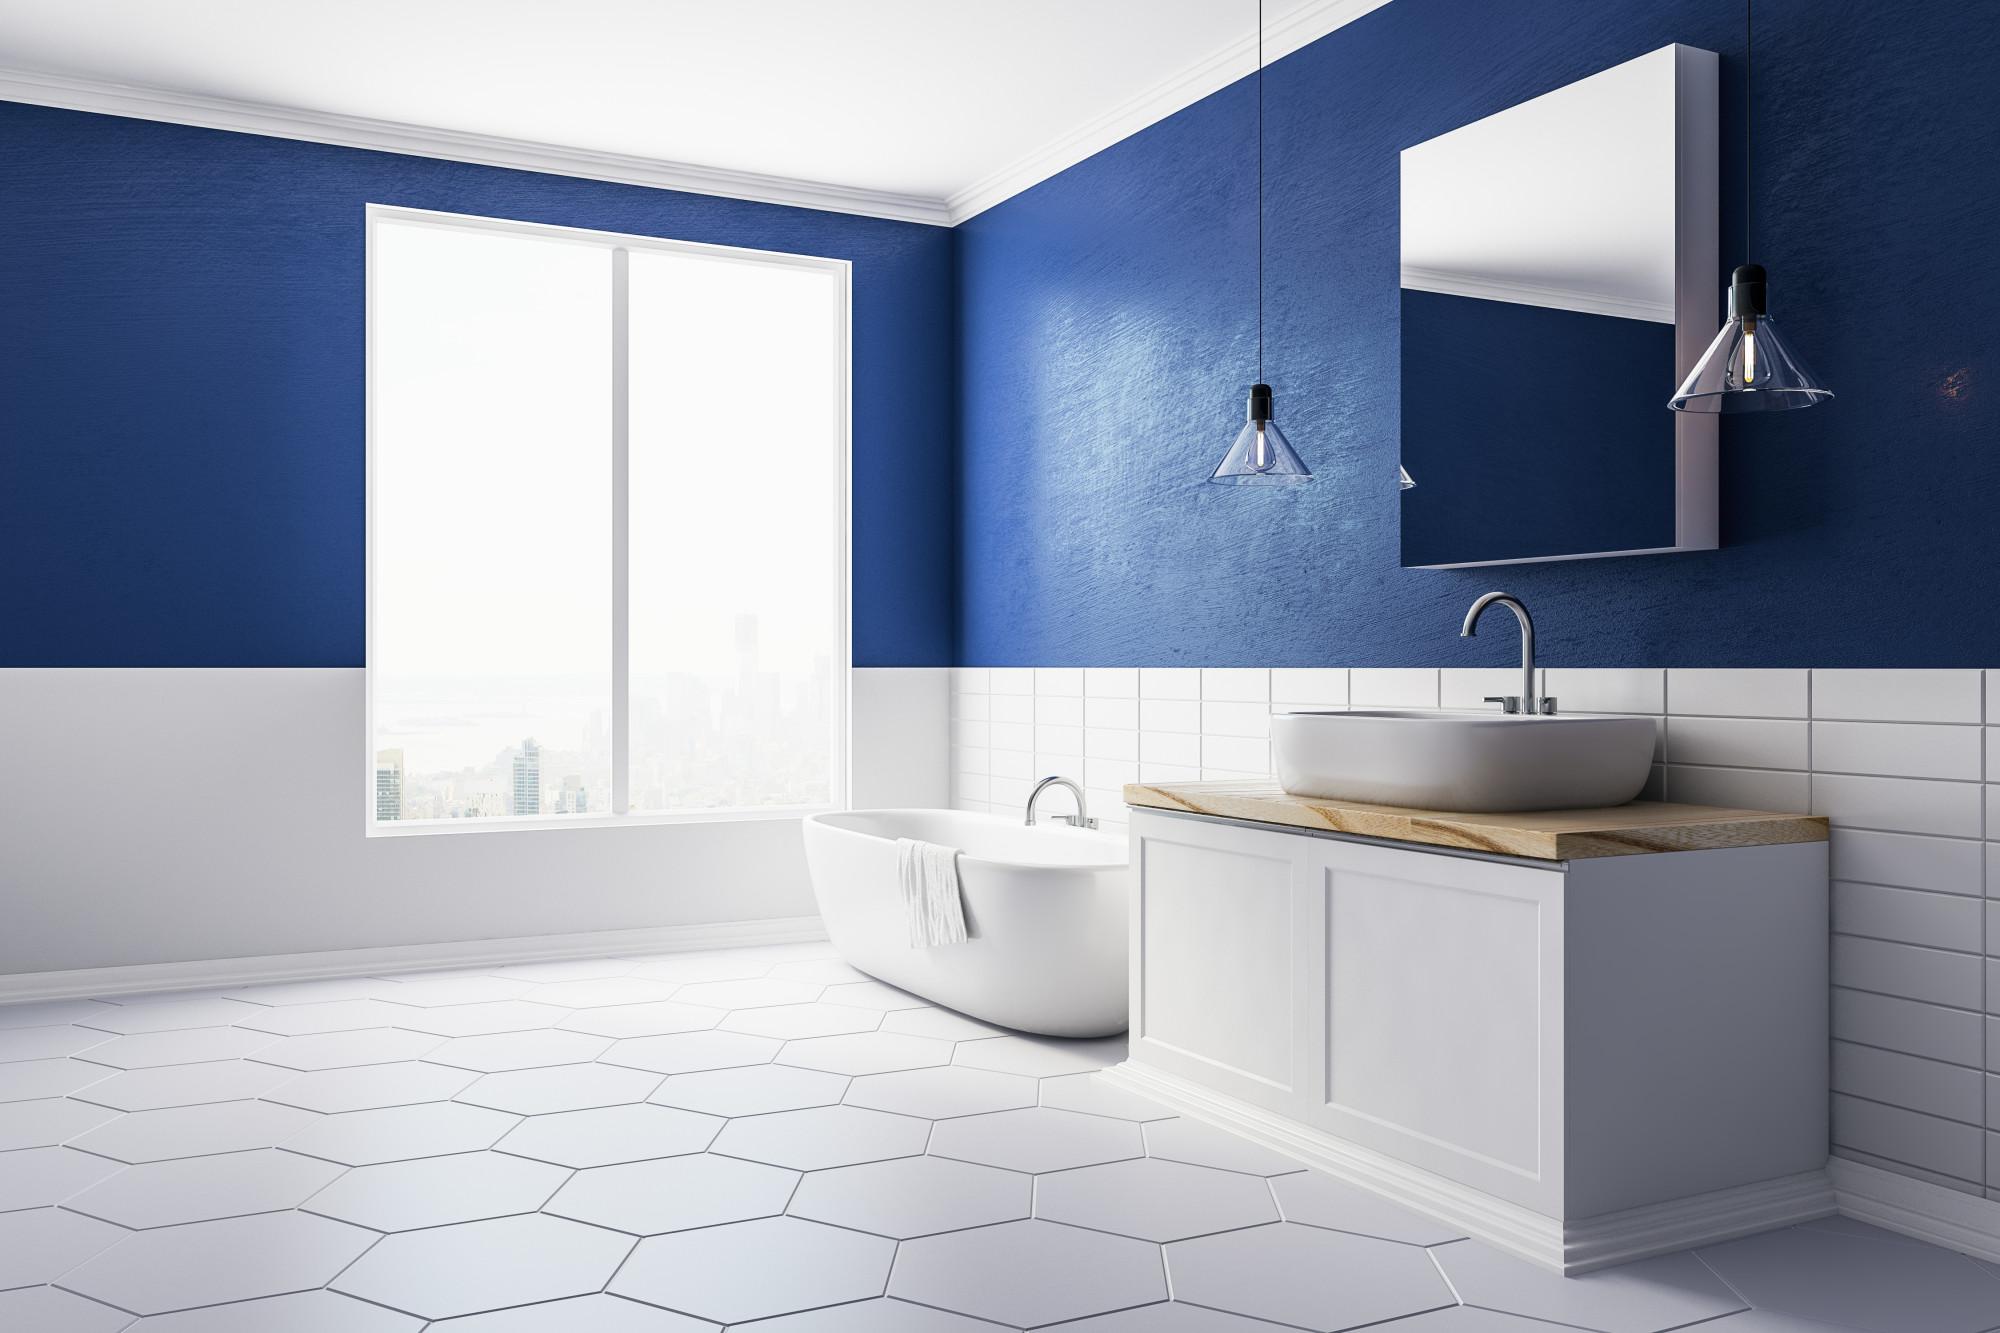 how to get the best ceramic tile for bathroom floors a complete guide belk tile